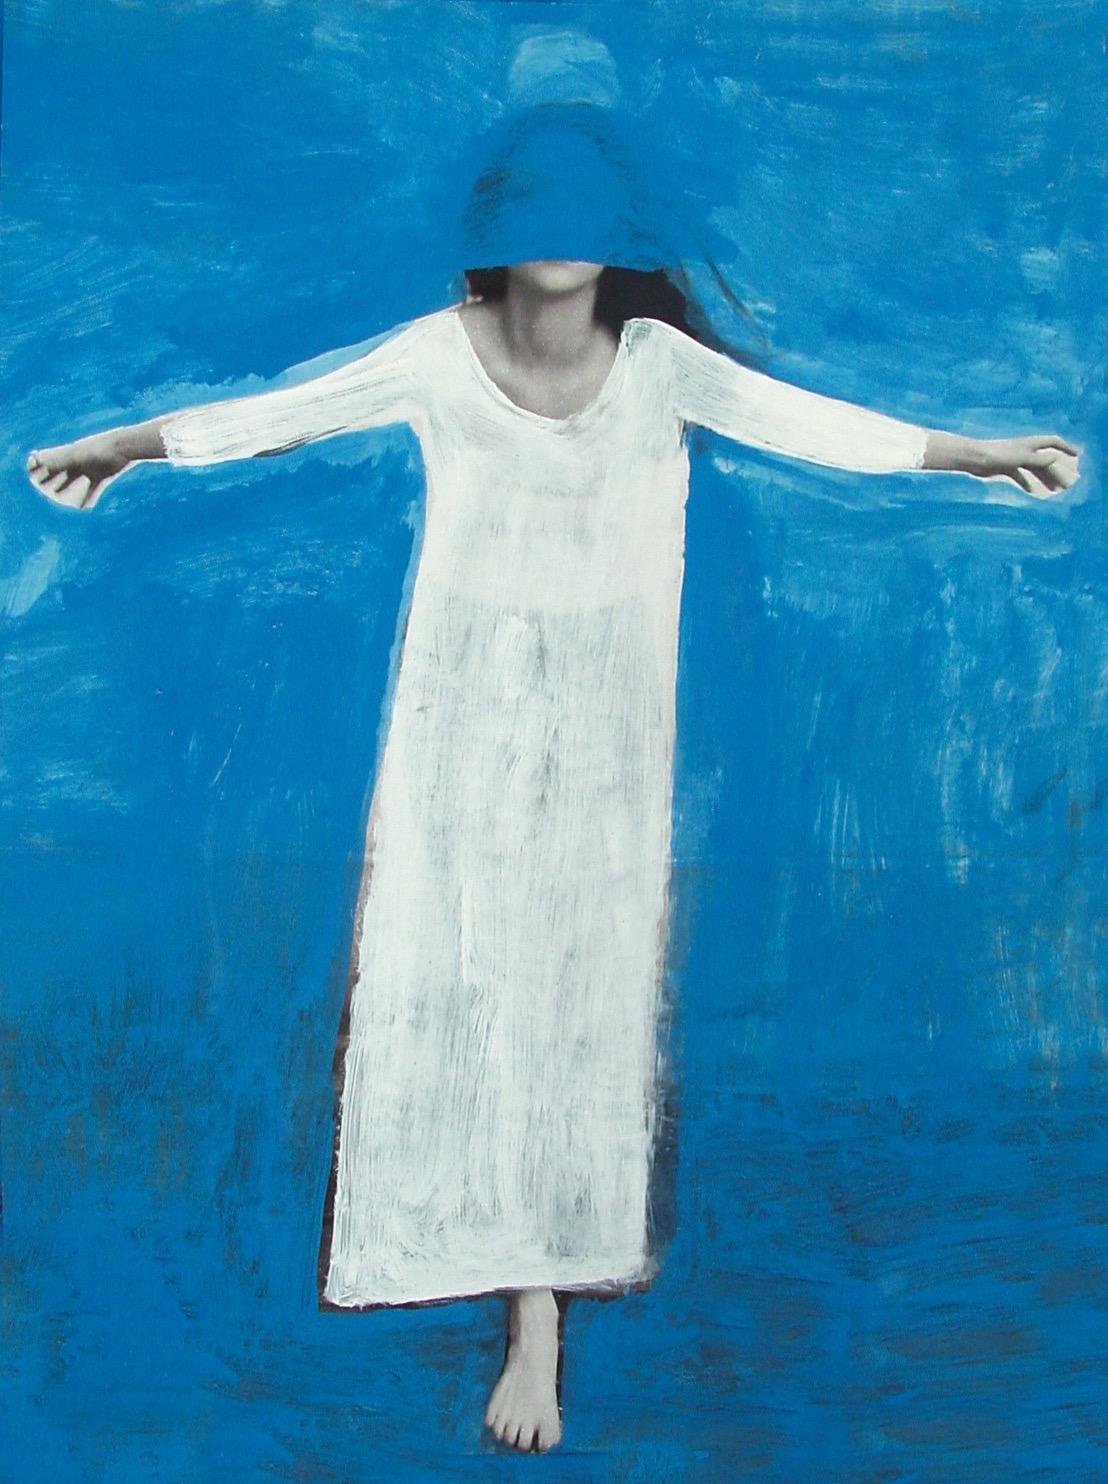 Maria angelo in volo